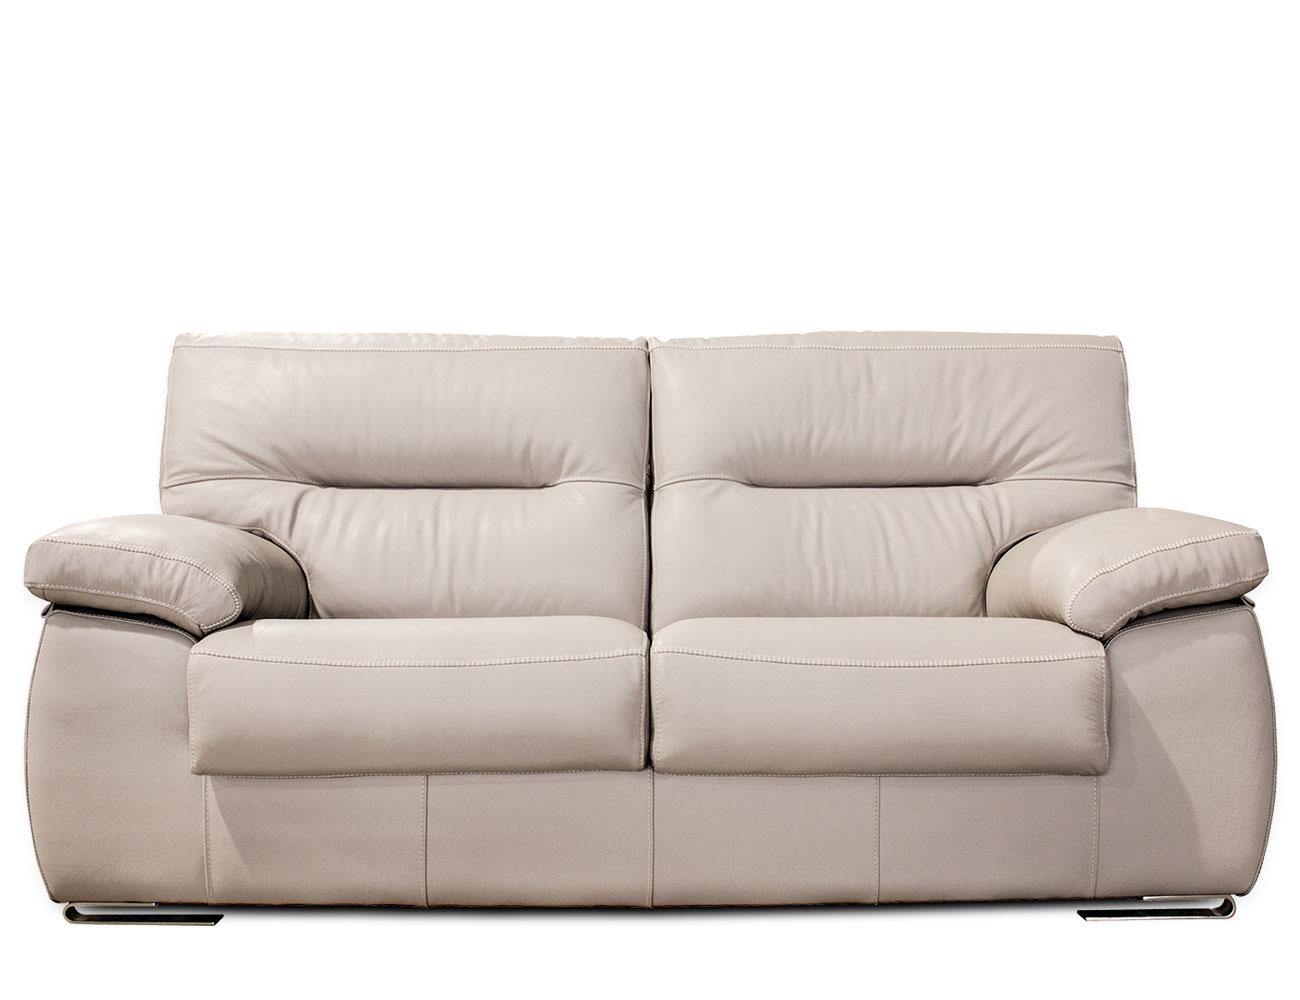 Sofa piel alta calidad beig beige marron chocolate